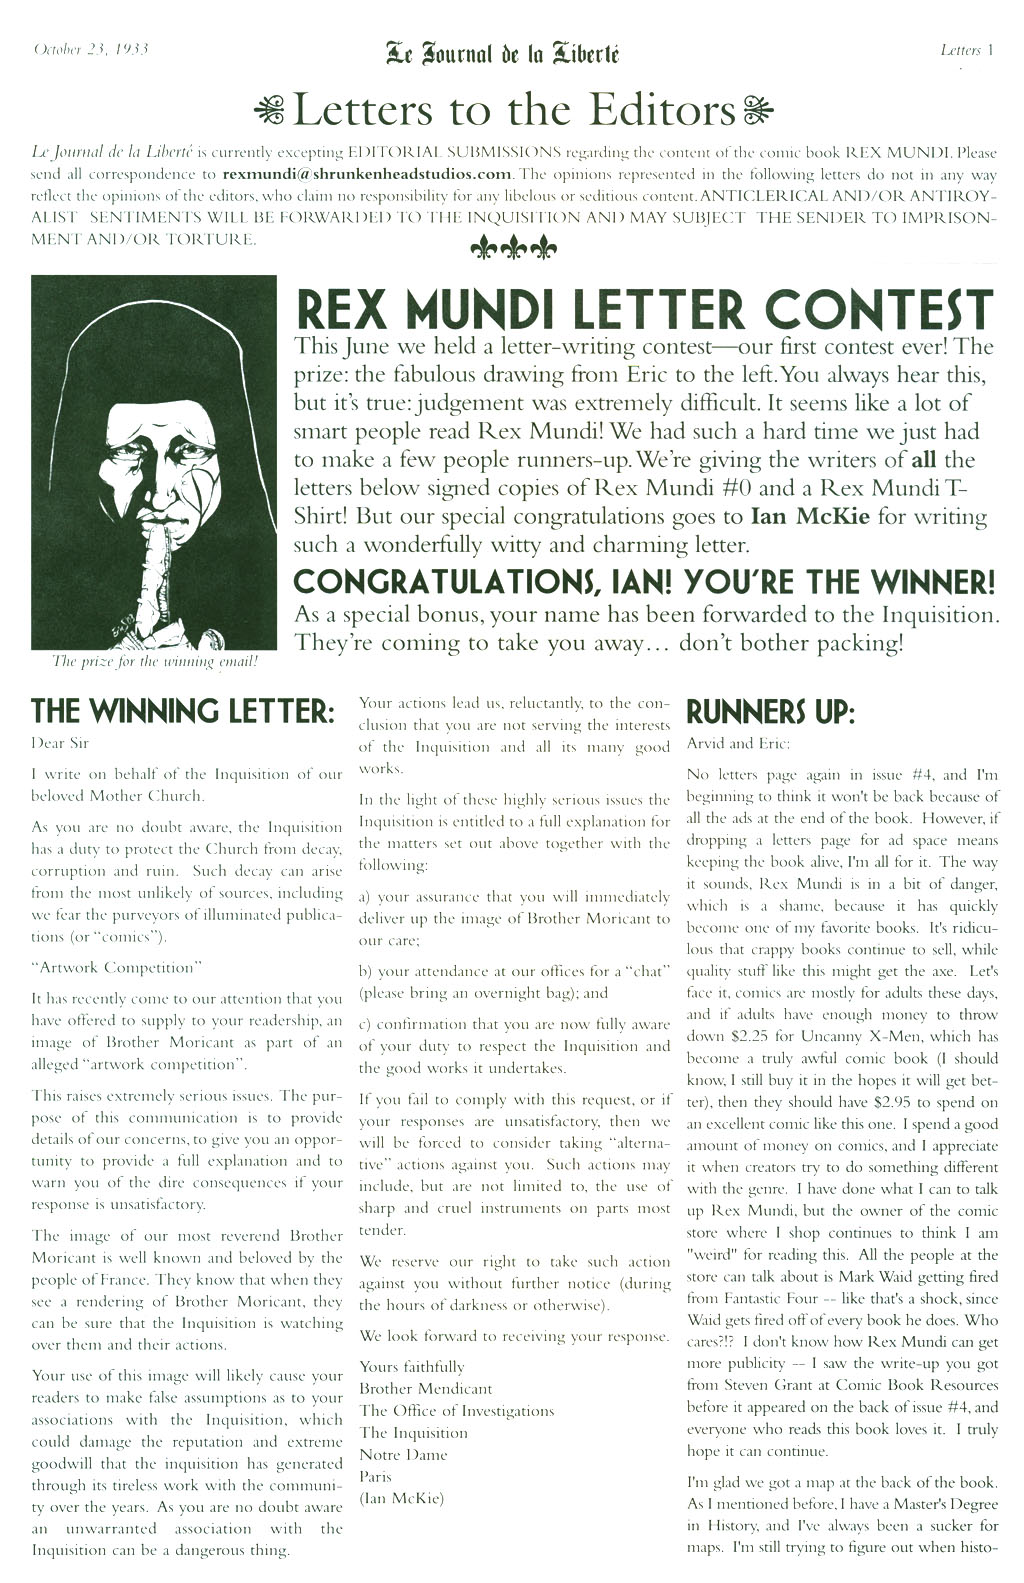 Read online Rex Mundi comic -  Issue #5 - 28